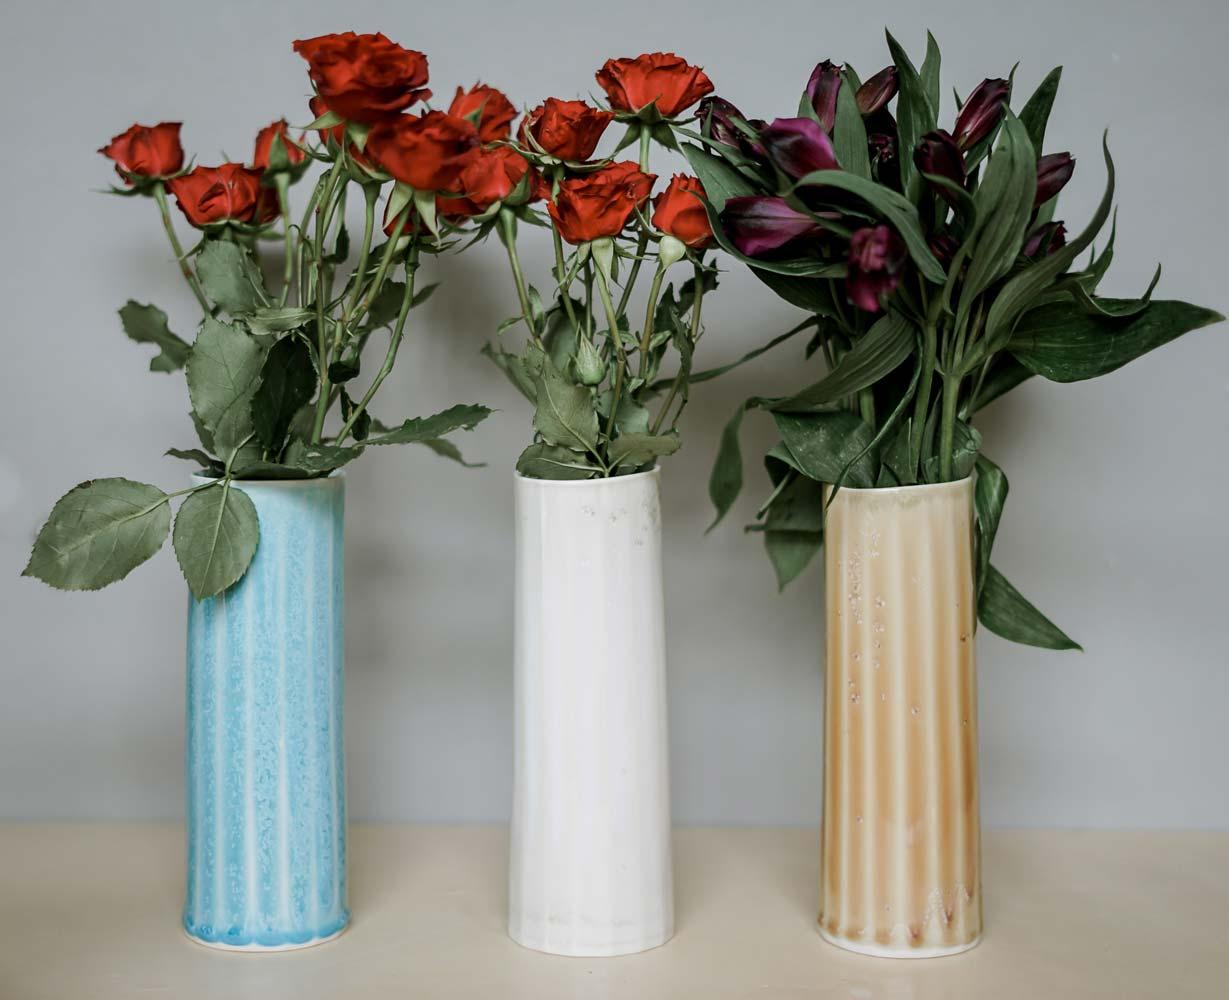 Vase-2018-Web-3.jpg